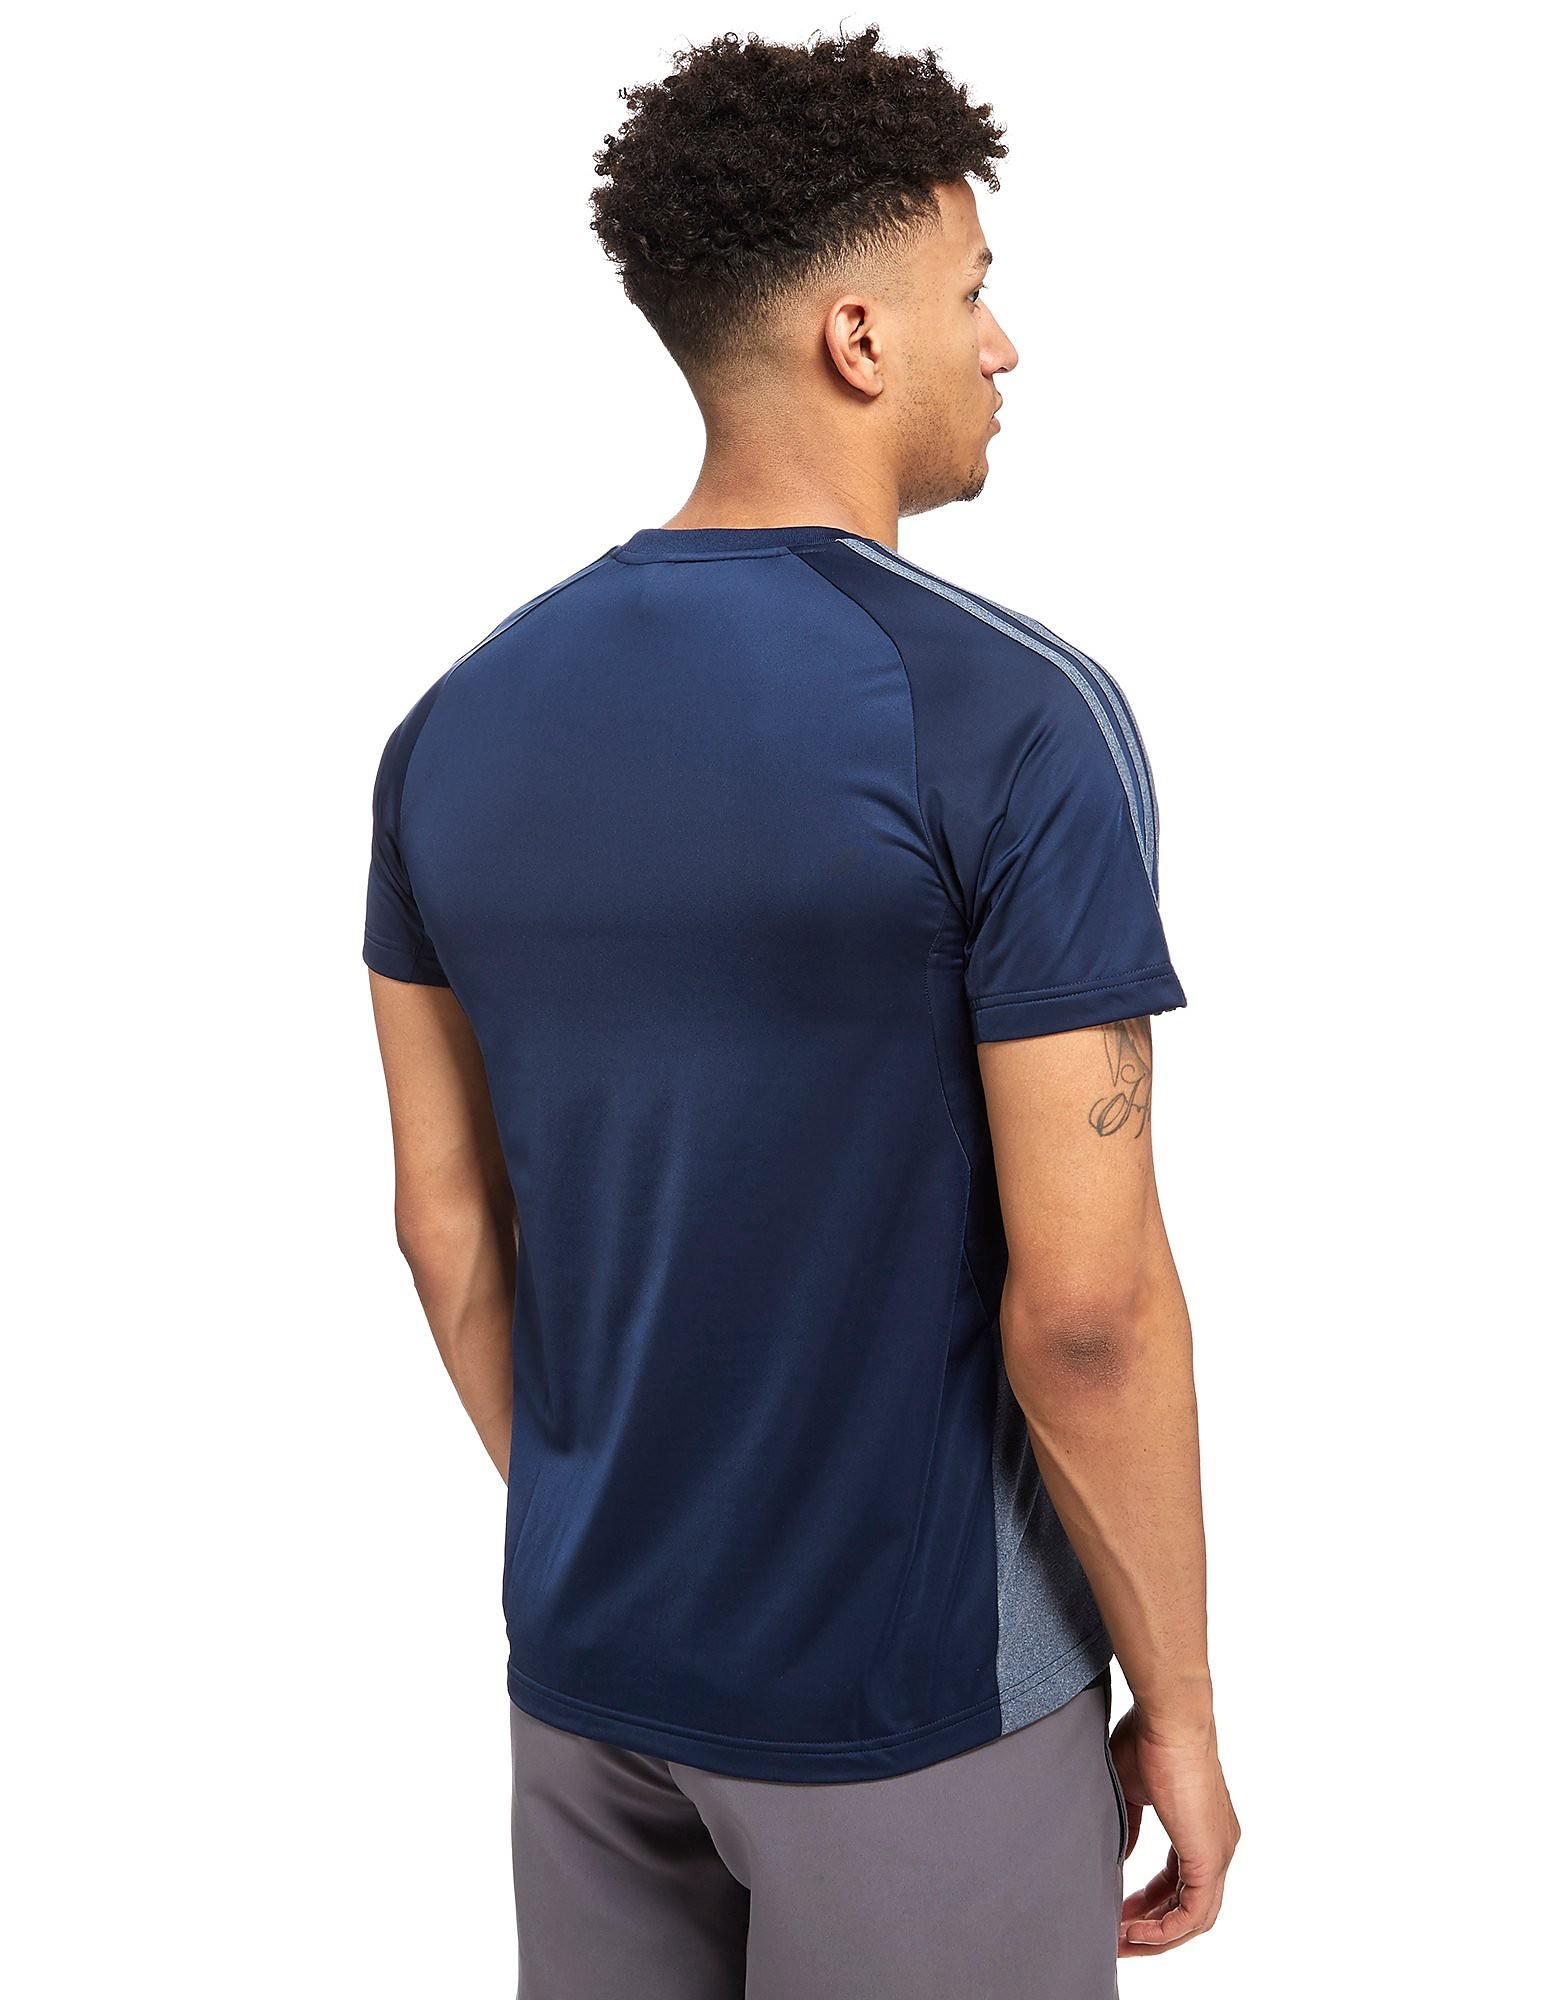 adidas T-shirt Reflex Poly Homme